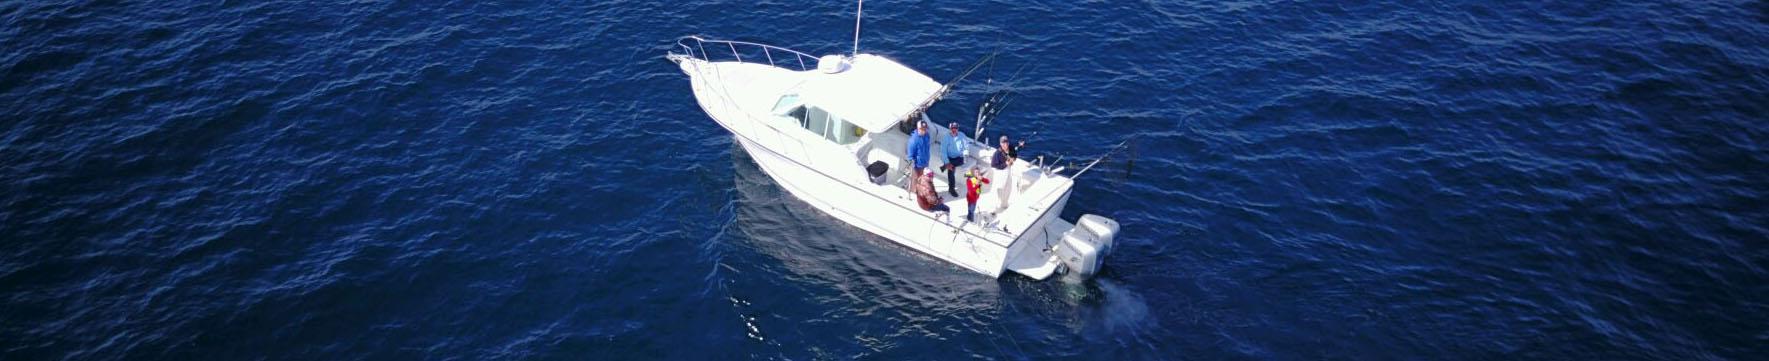 Lake Michigan Offshore fishing